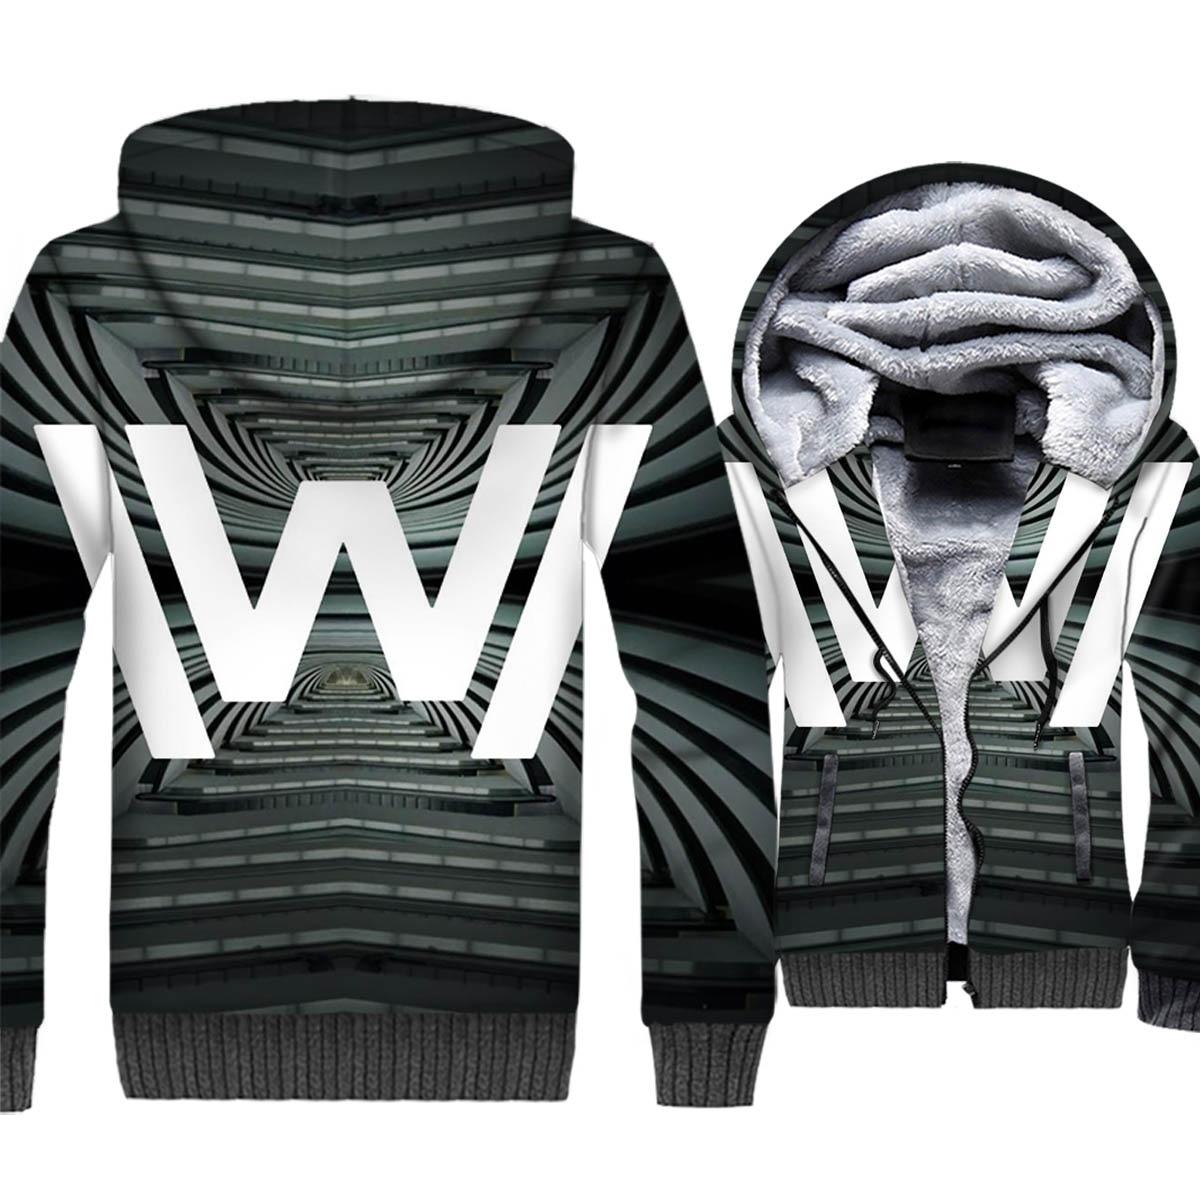 winter casual wool liner zipper hoodies 2019 new hot TV series Westworld jackets coats sportswear harajuku plus tracksuits M-5XL